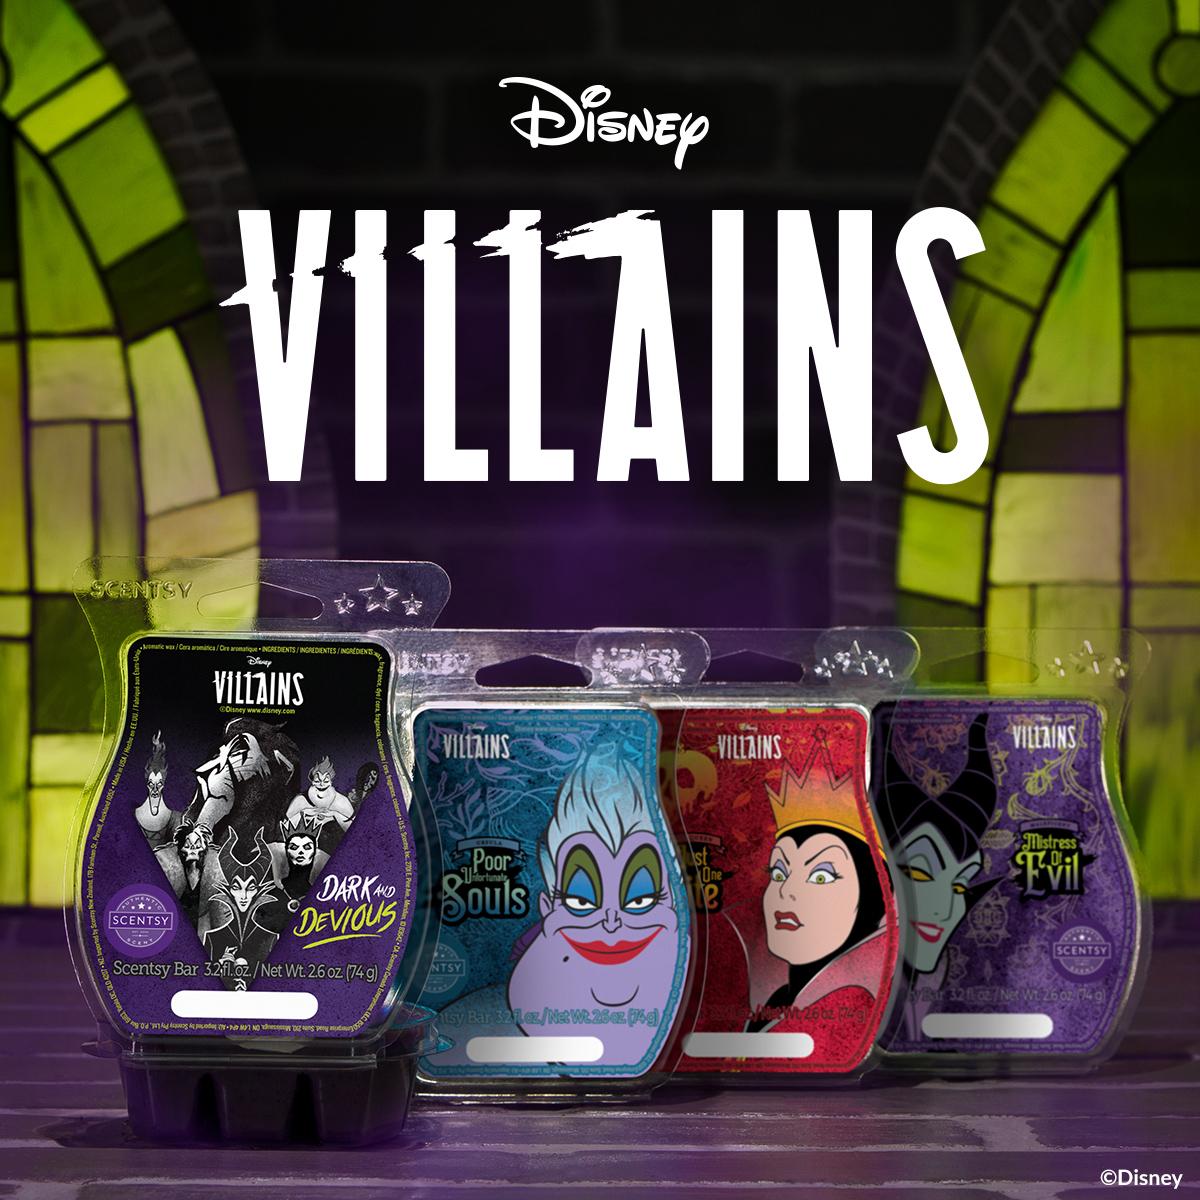 Disney Villains: Dark and Devious